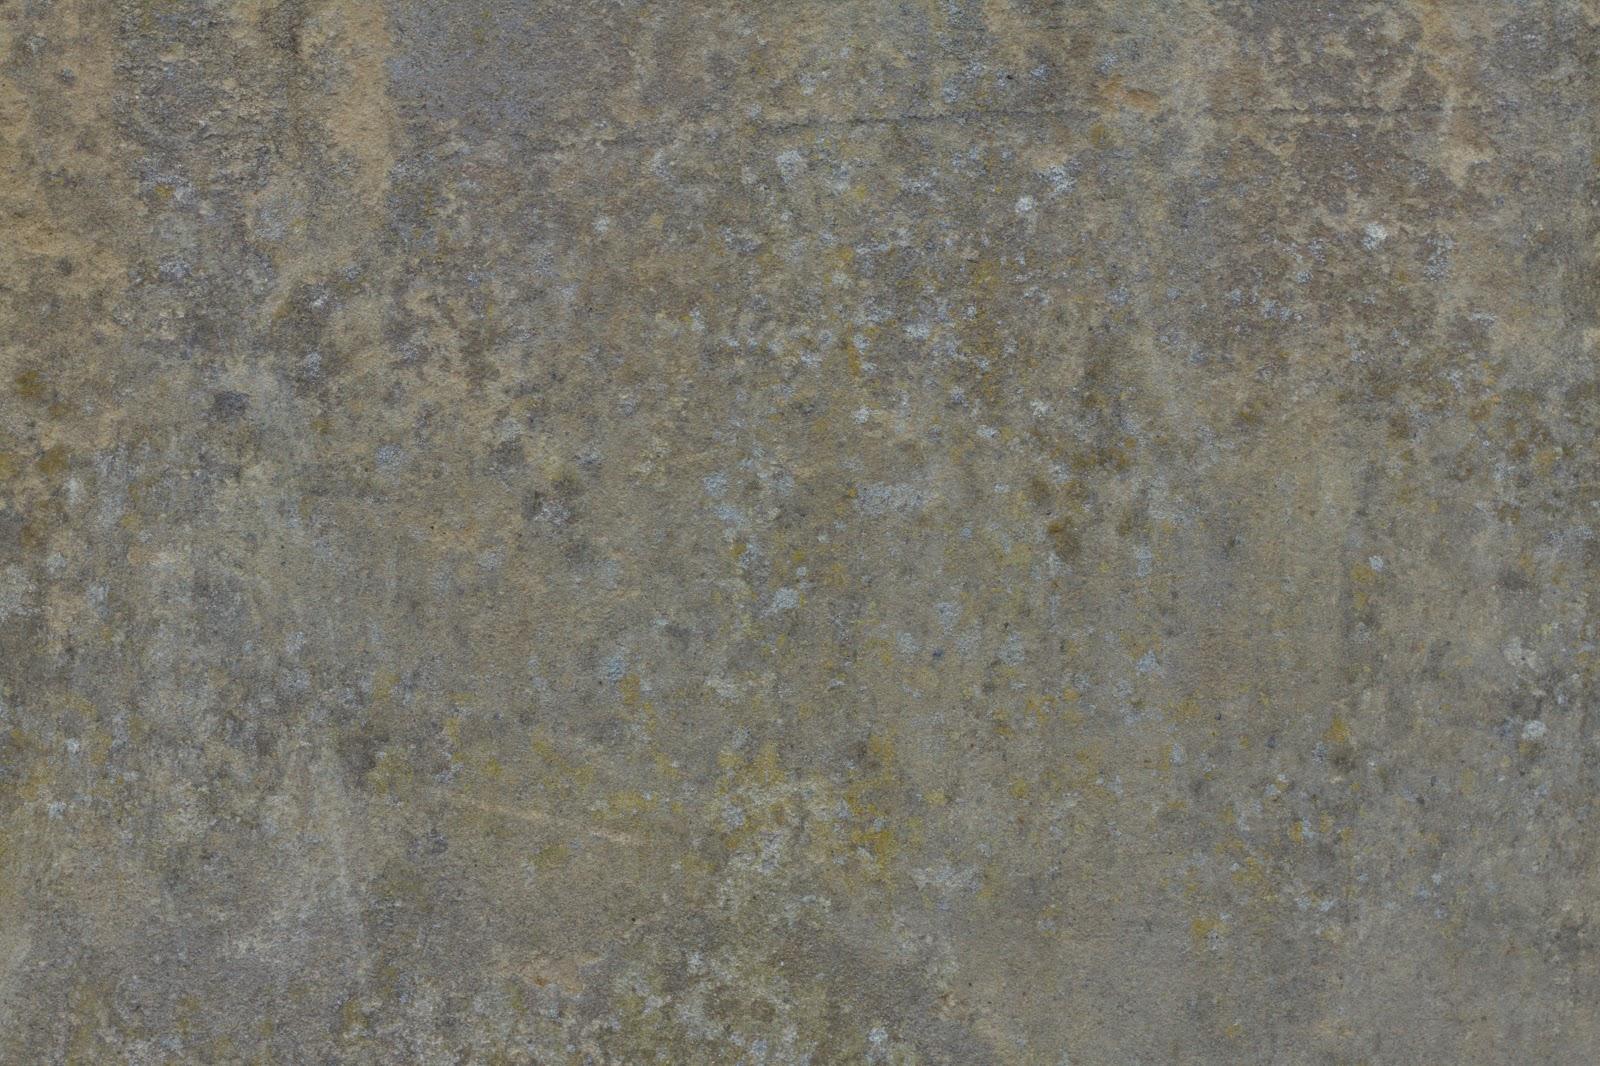 Wall plaster stucco grungy grunge moss texture ver2 4770x3178